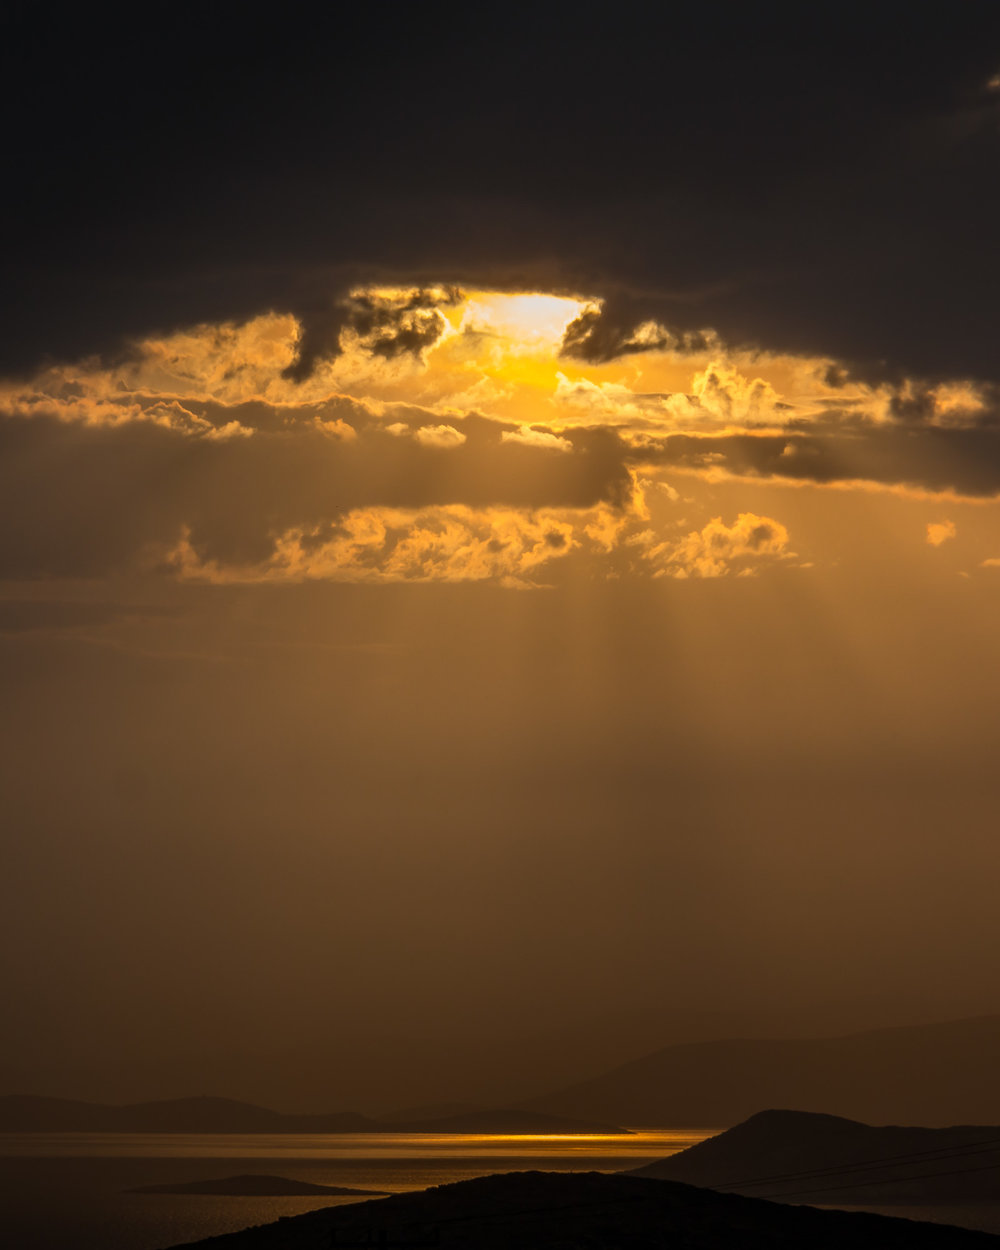 sunset-amorgos-stemajourneys.com.jpg